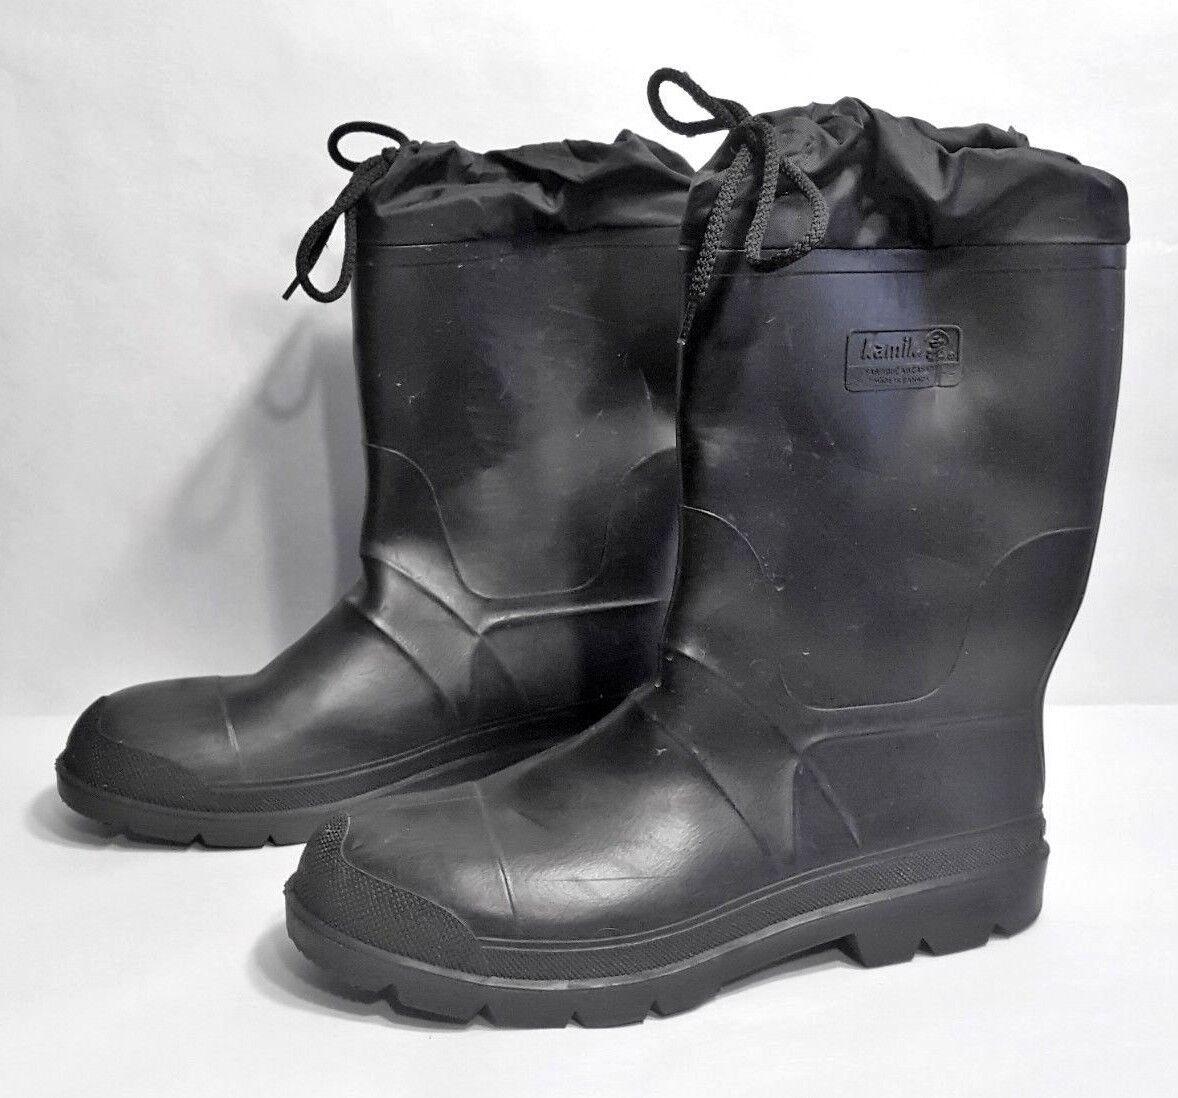 Excelente condición usada para hombres Kamik Alto Impermeable aisladas Invierno botas De Nieve Negro